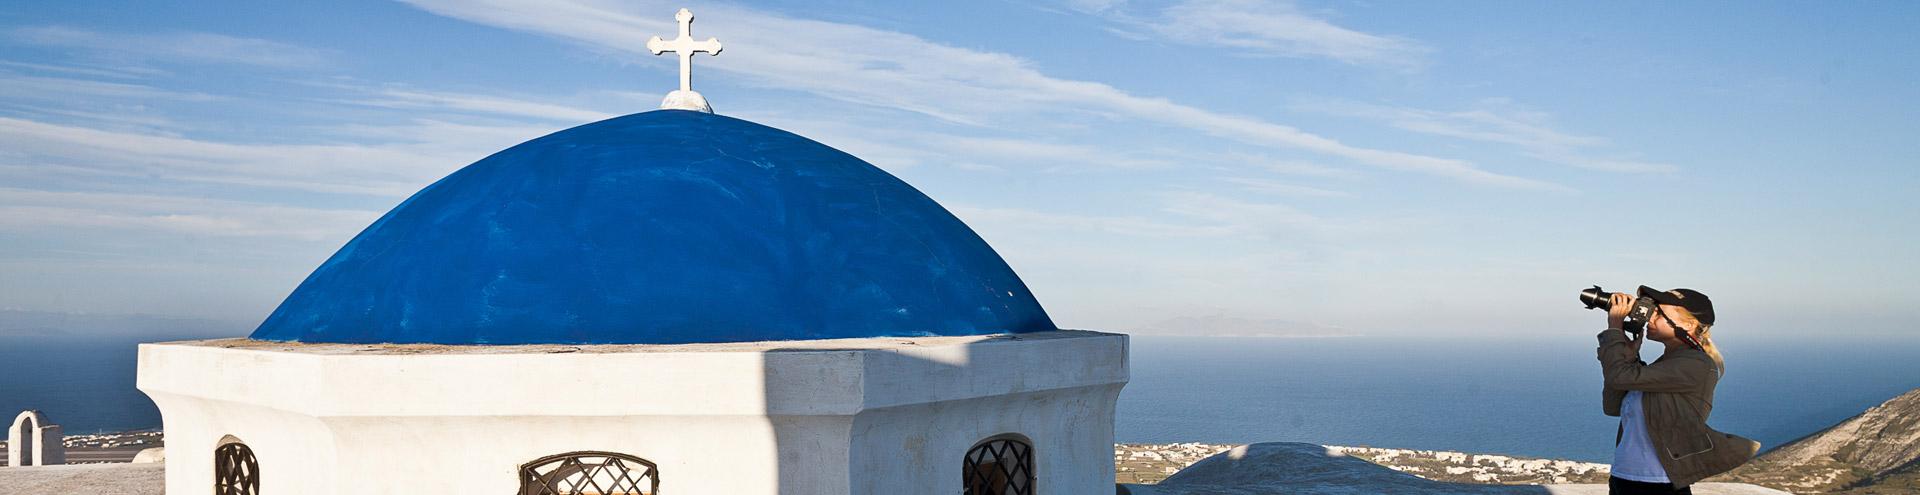 Kirche in Pyrgos und Svetlana